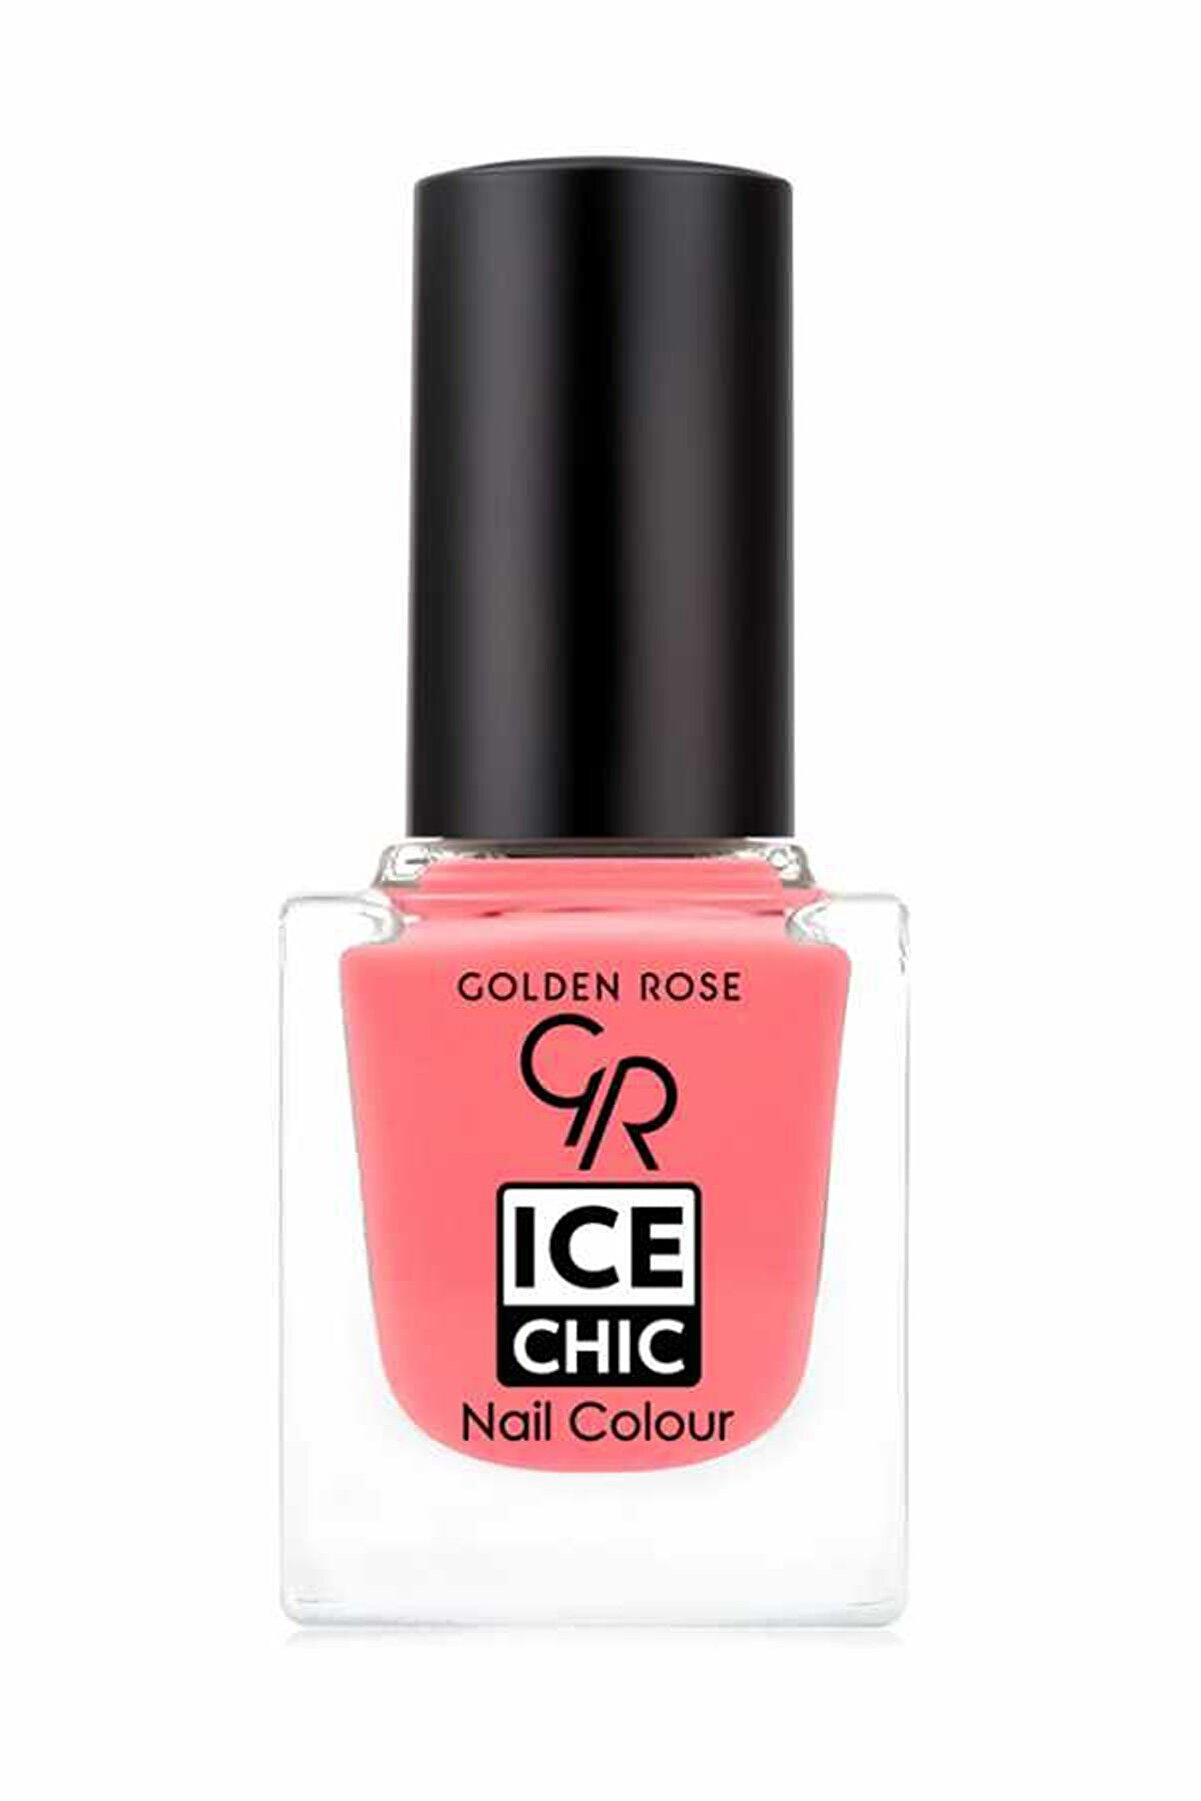 Golden Rose Oje - Ice Chic  No:88 8691190860882